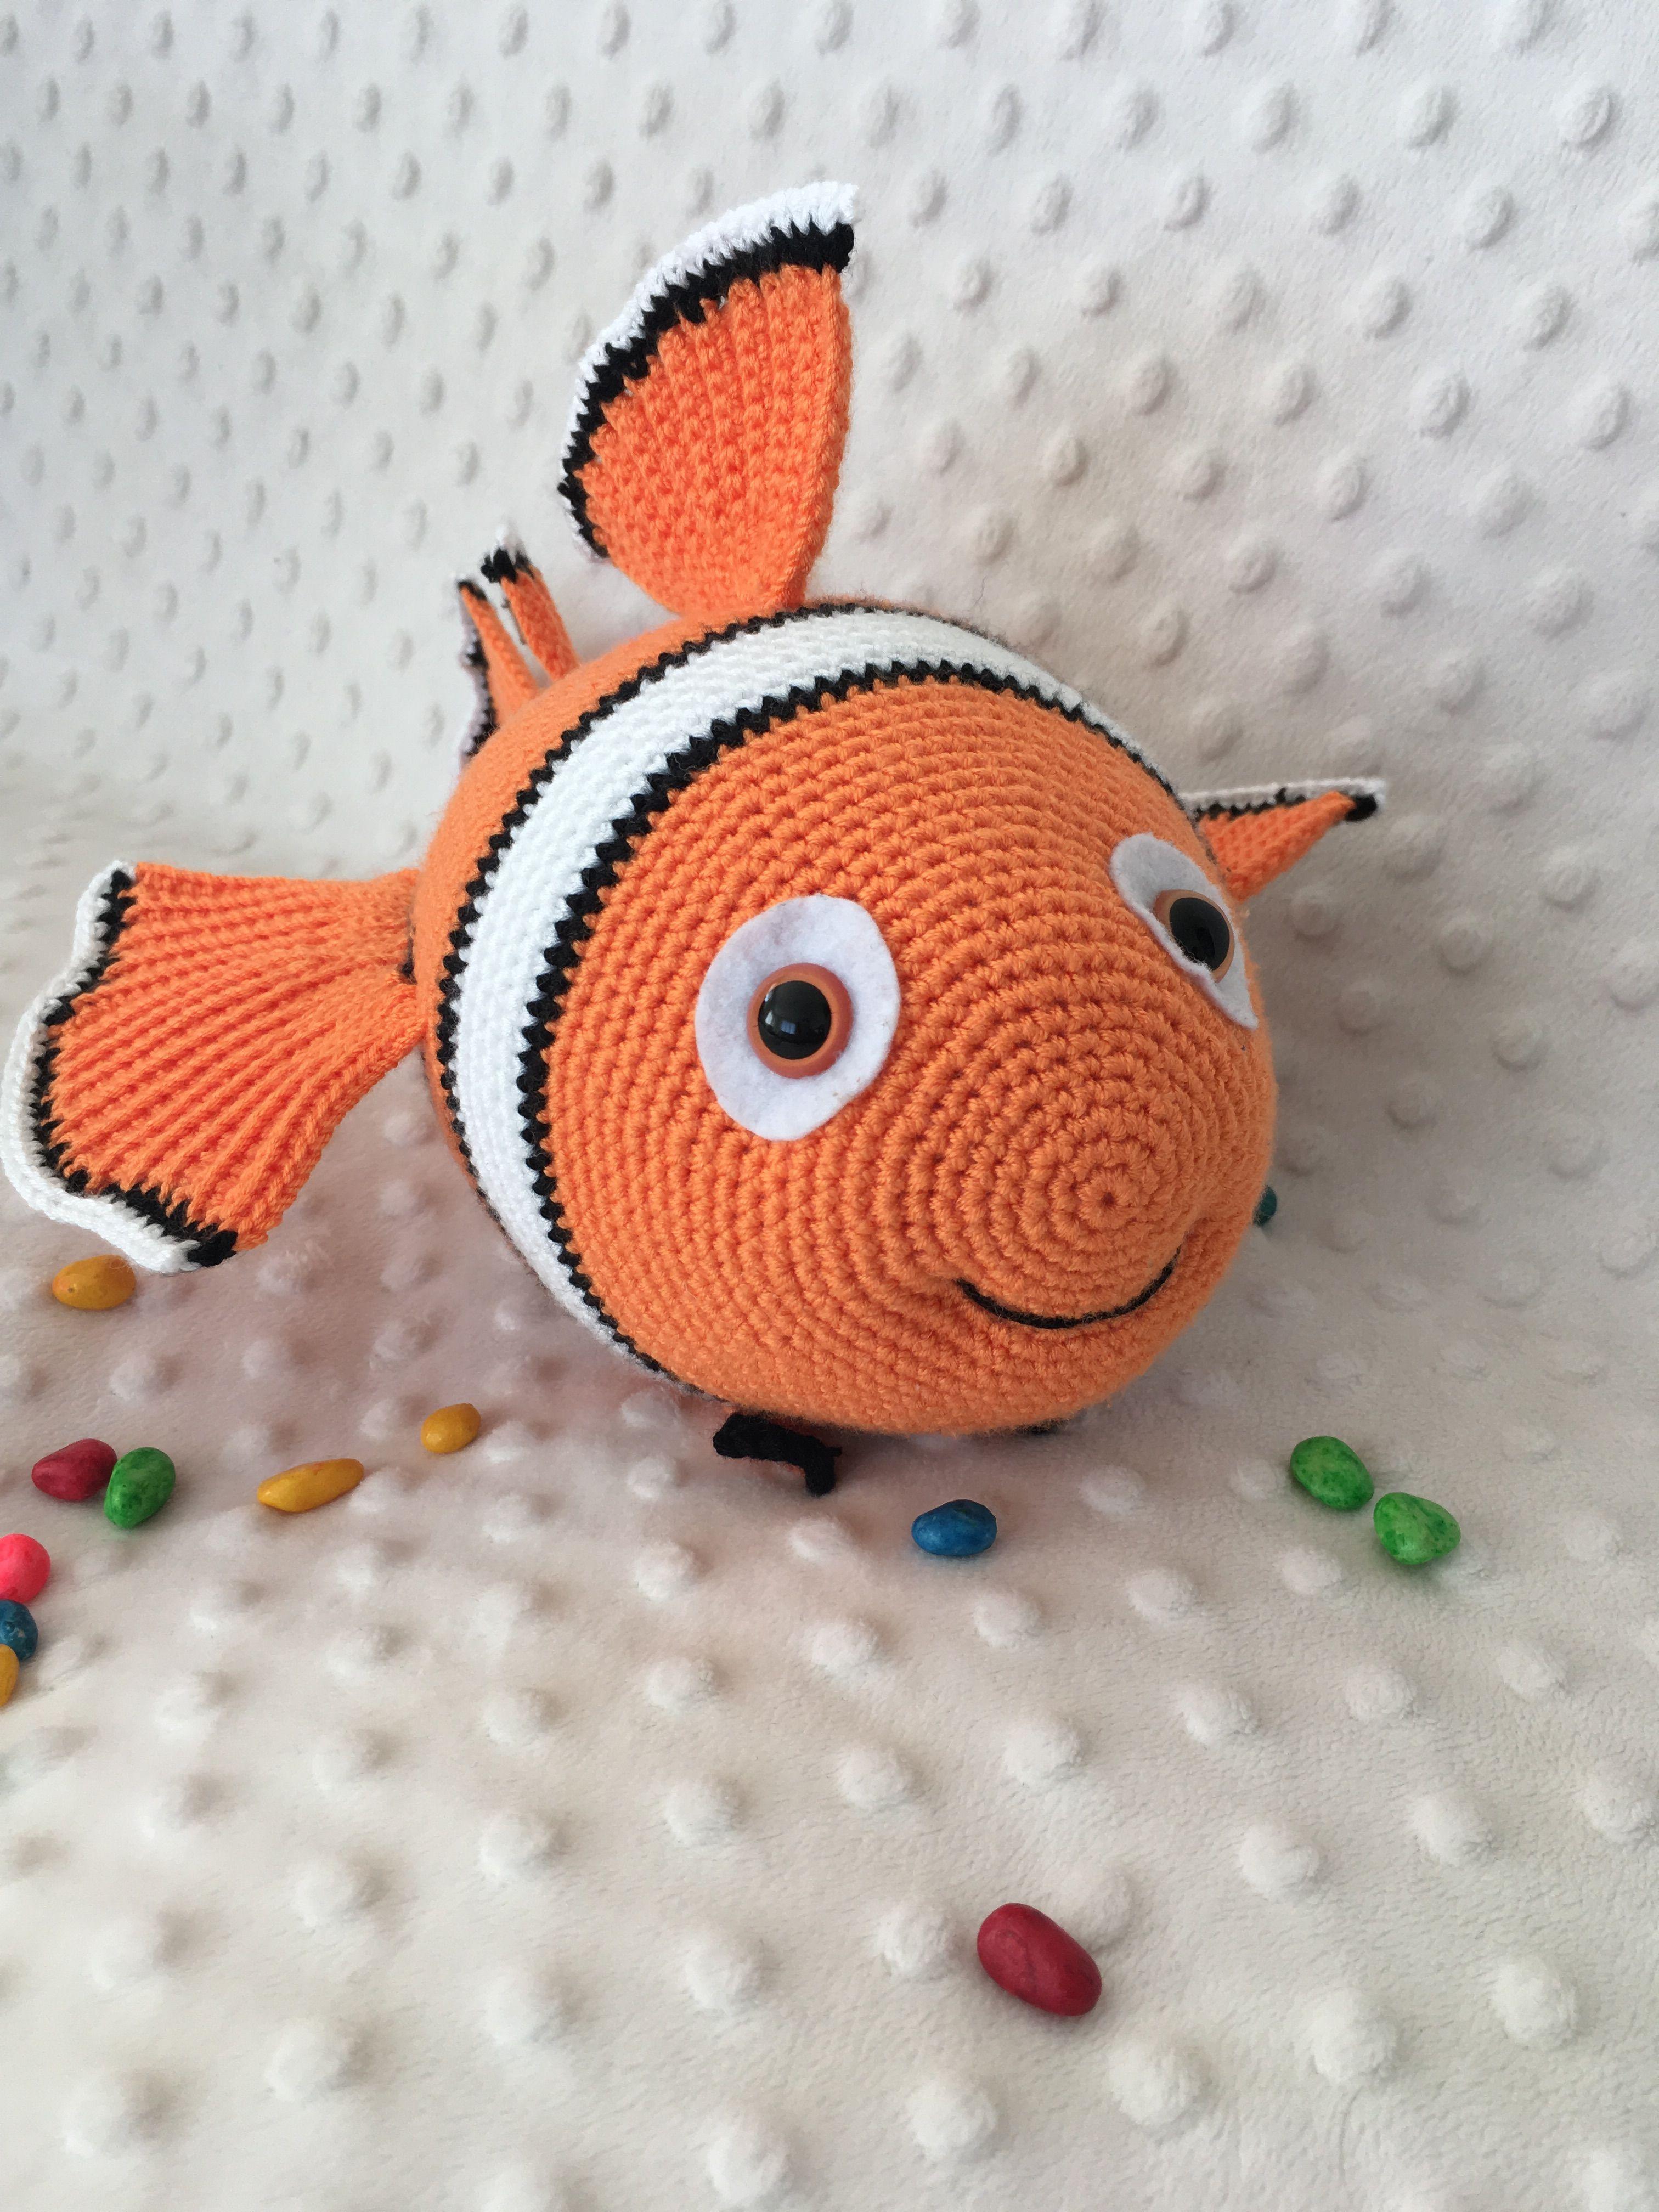 Crochet Nemo fish crochet clown fish handmade fish Nemo | Etsy | 4032x3024